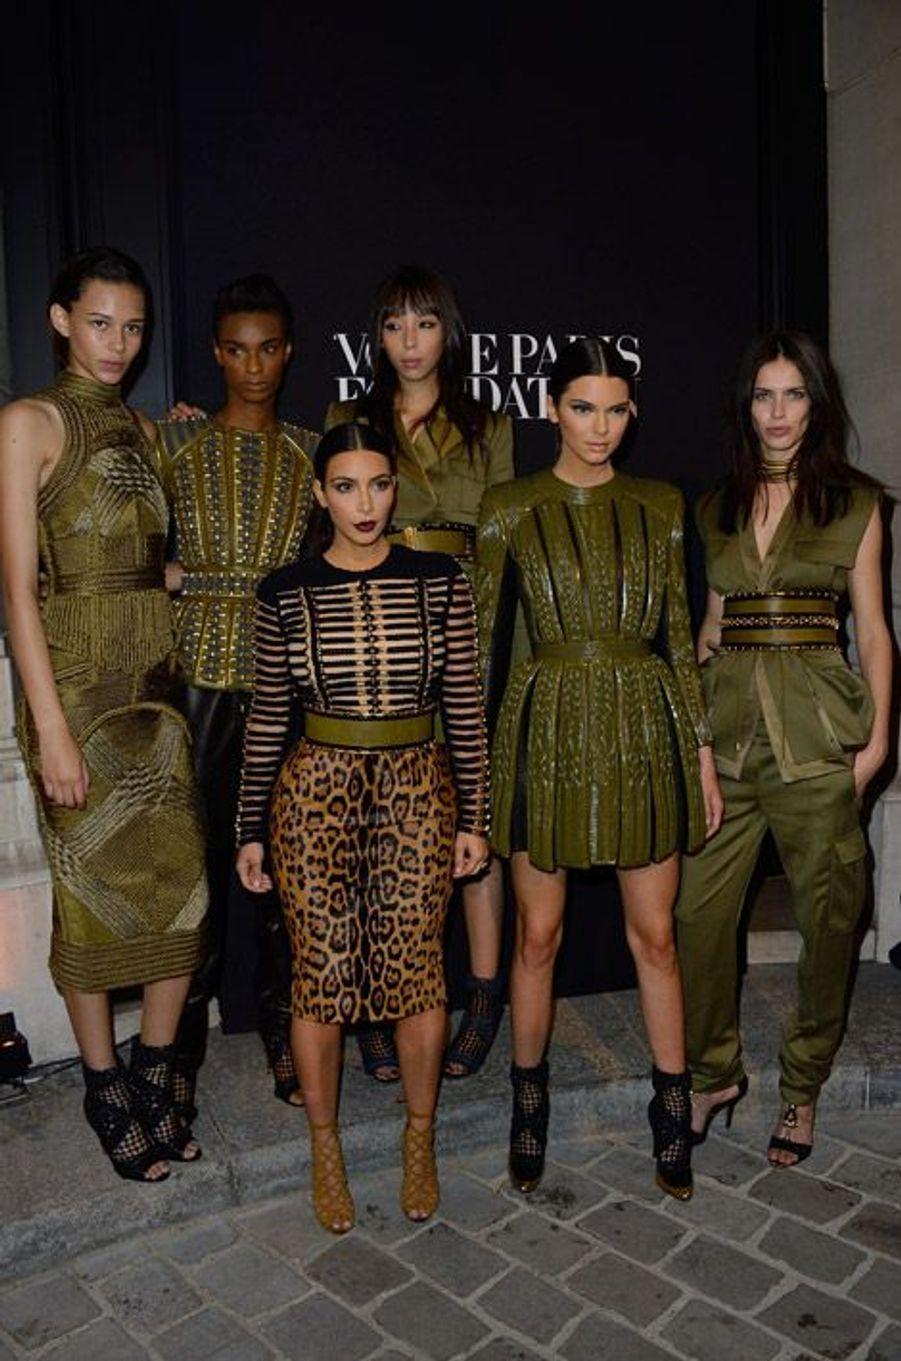 La star de la téléréalité Kim Kardashian, les mannequin Kendall Jenner, Binx Walton, Ysaunny Brito, Issa Lish et Amanda Wellsh posent en Balmain...